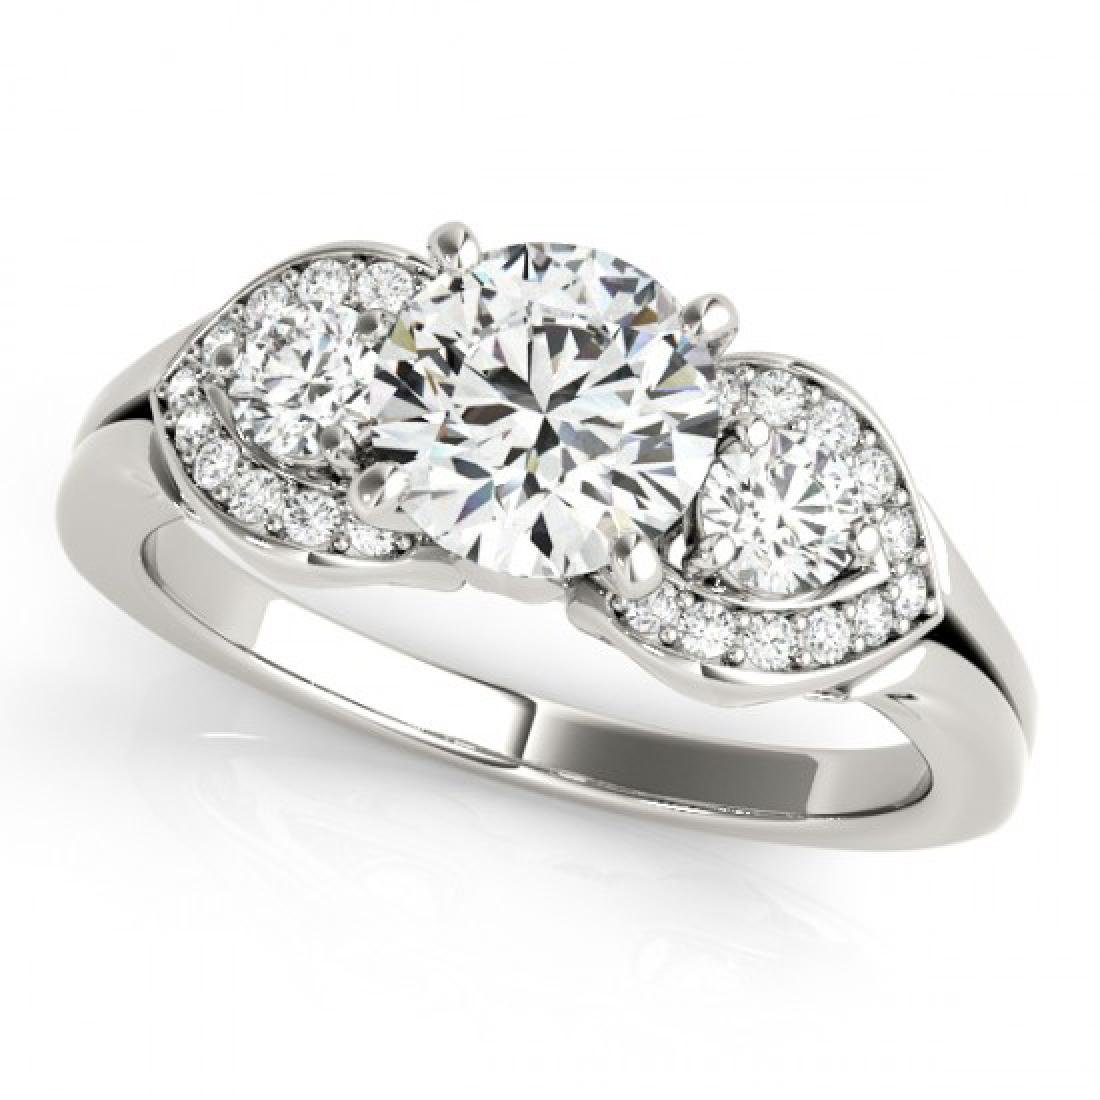 1.7 CTW Certified VS/SI Diamond 3 Stone Ring 14K White